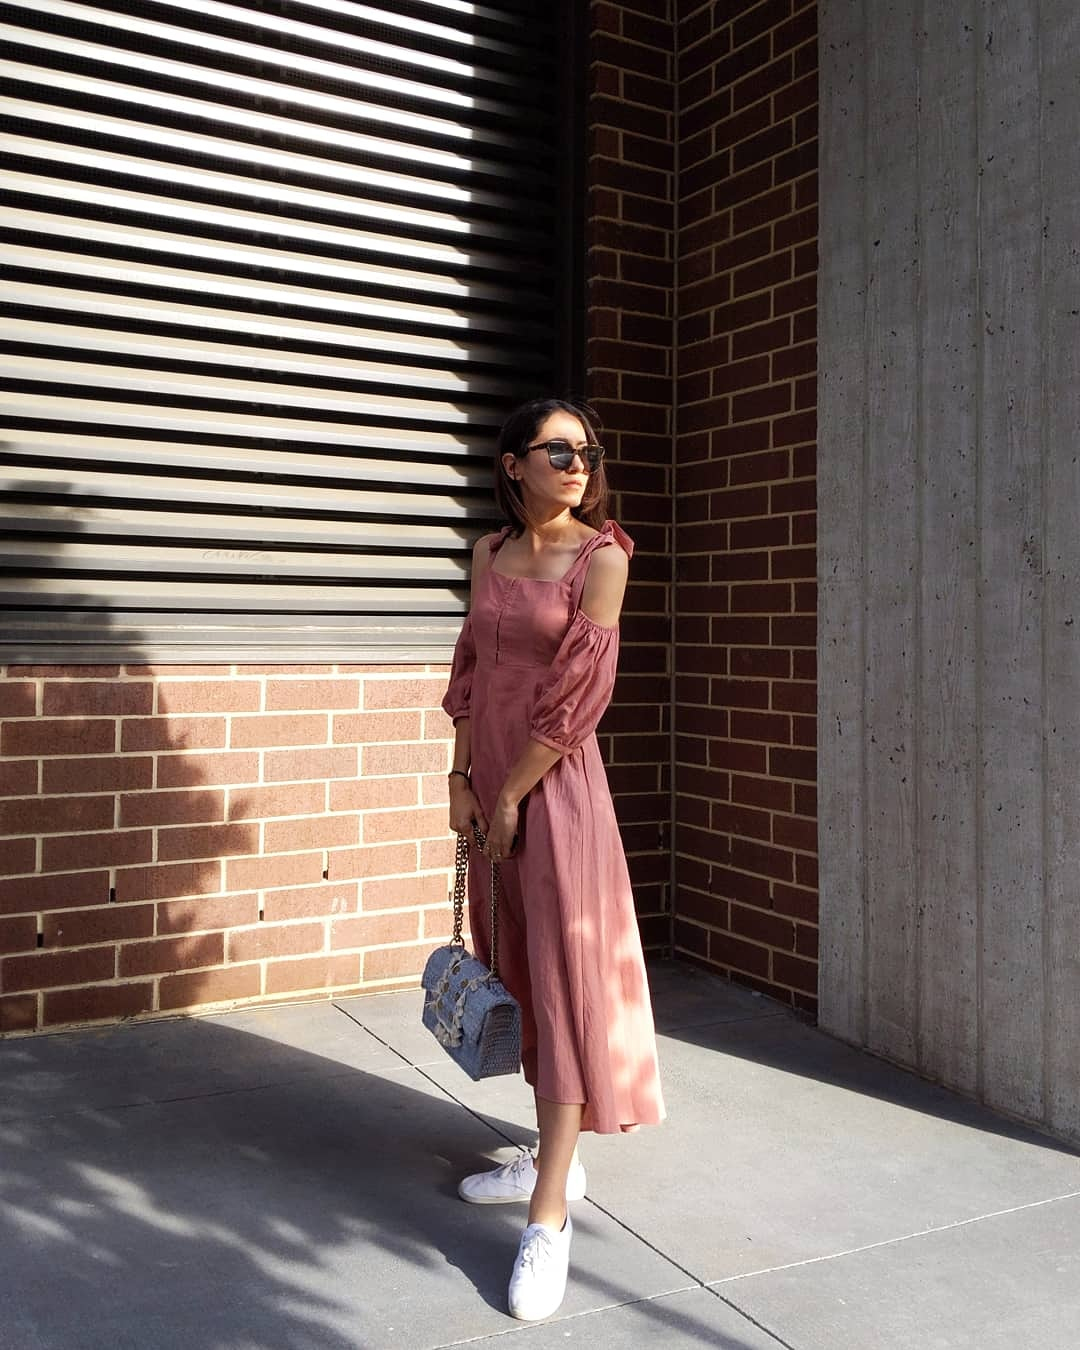 Wearing: Capulet dress | Kooreloo  bag  | Walmart shoes